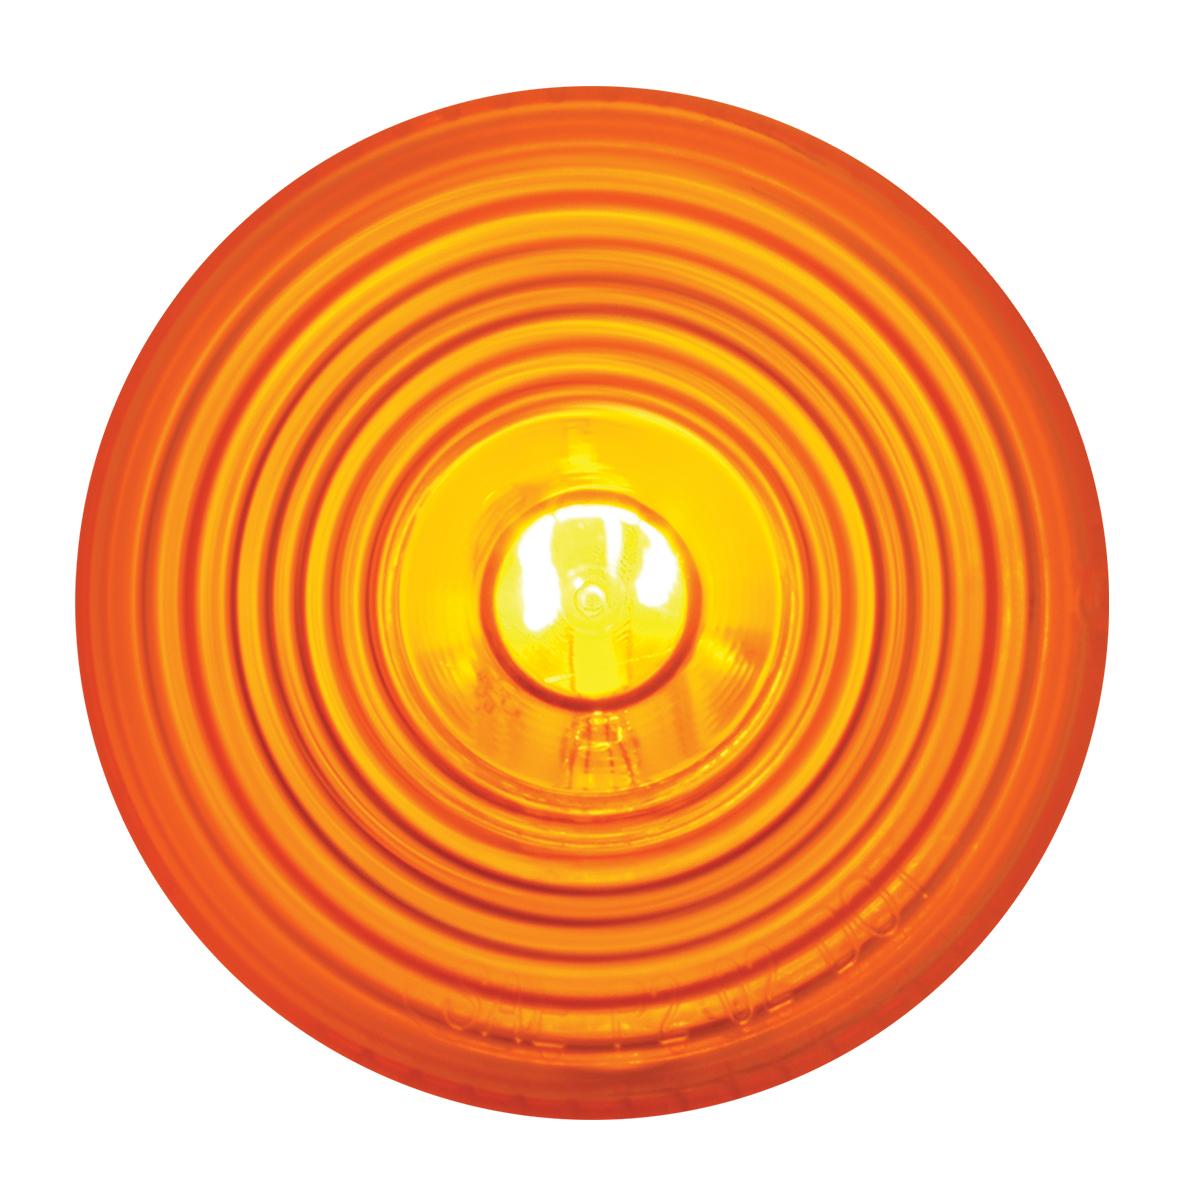 #80723 Incandescent Flat Amber/Amber Sealed Light